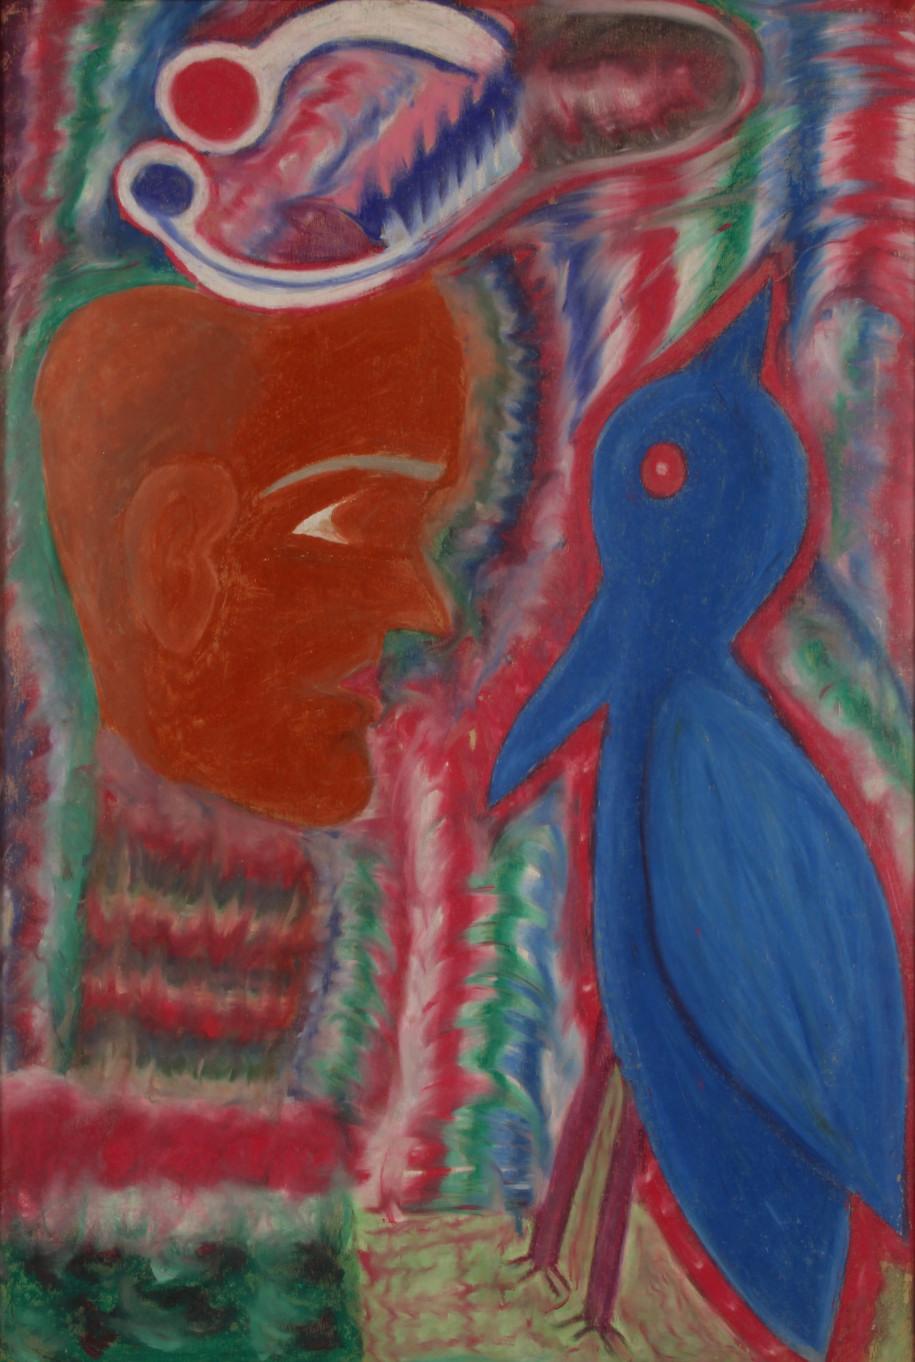 Untitled (Man and Bird), c. 1980